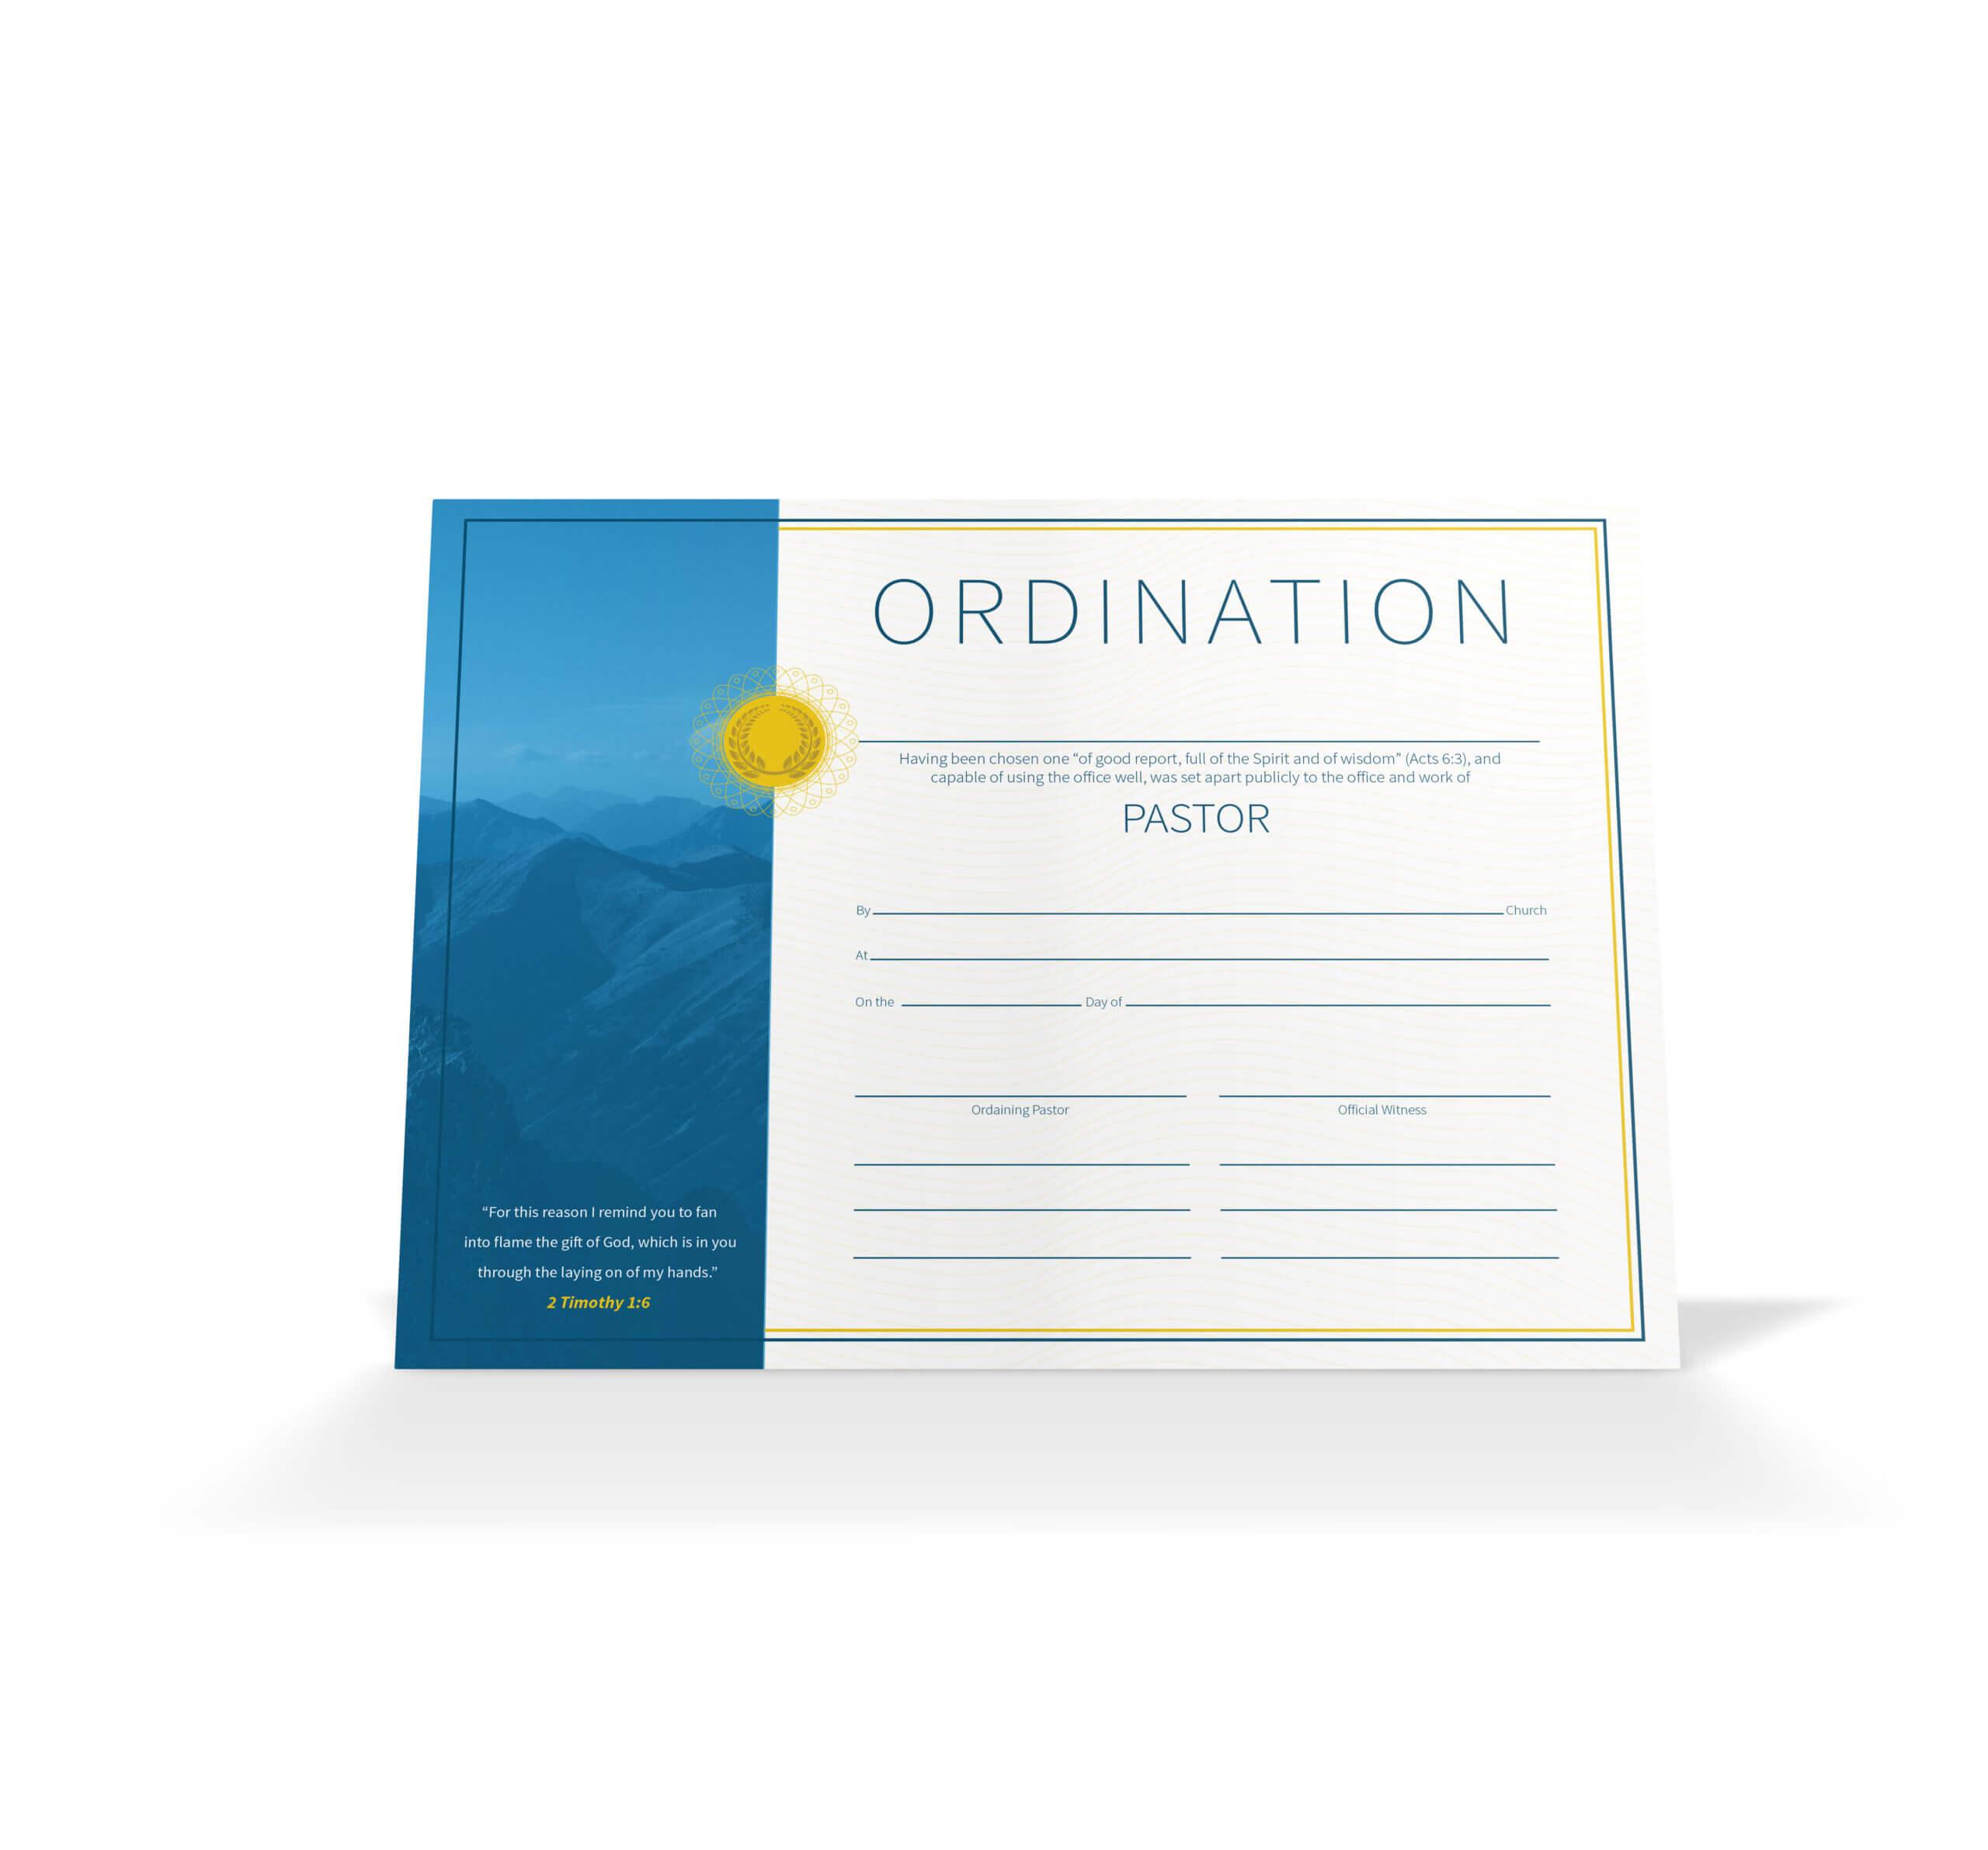 Pastor Ordination Certificate – Vineyard Digital Membership Throughout Ordination Certificate Template